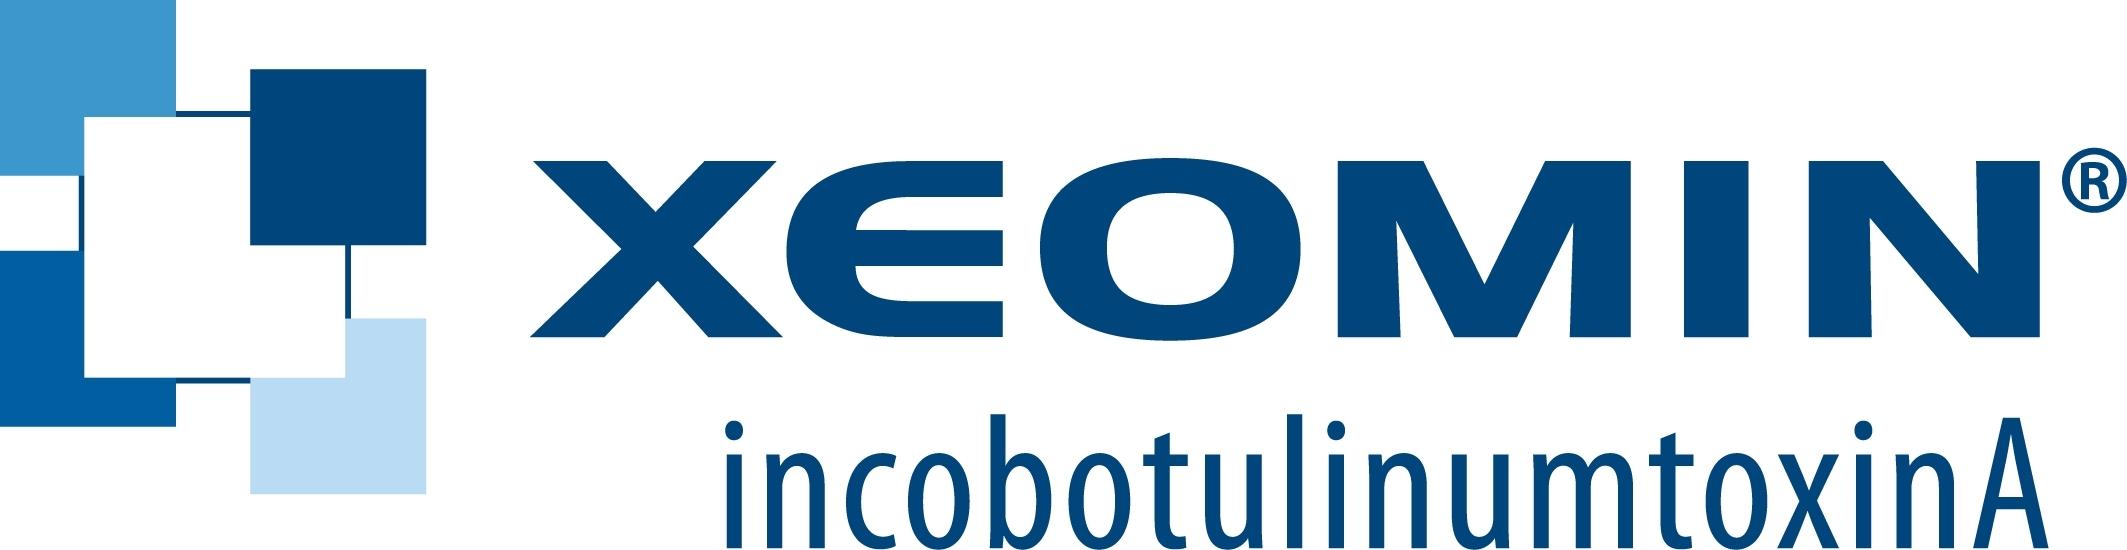 xeomin_logo_color